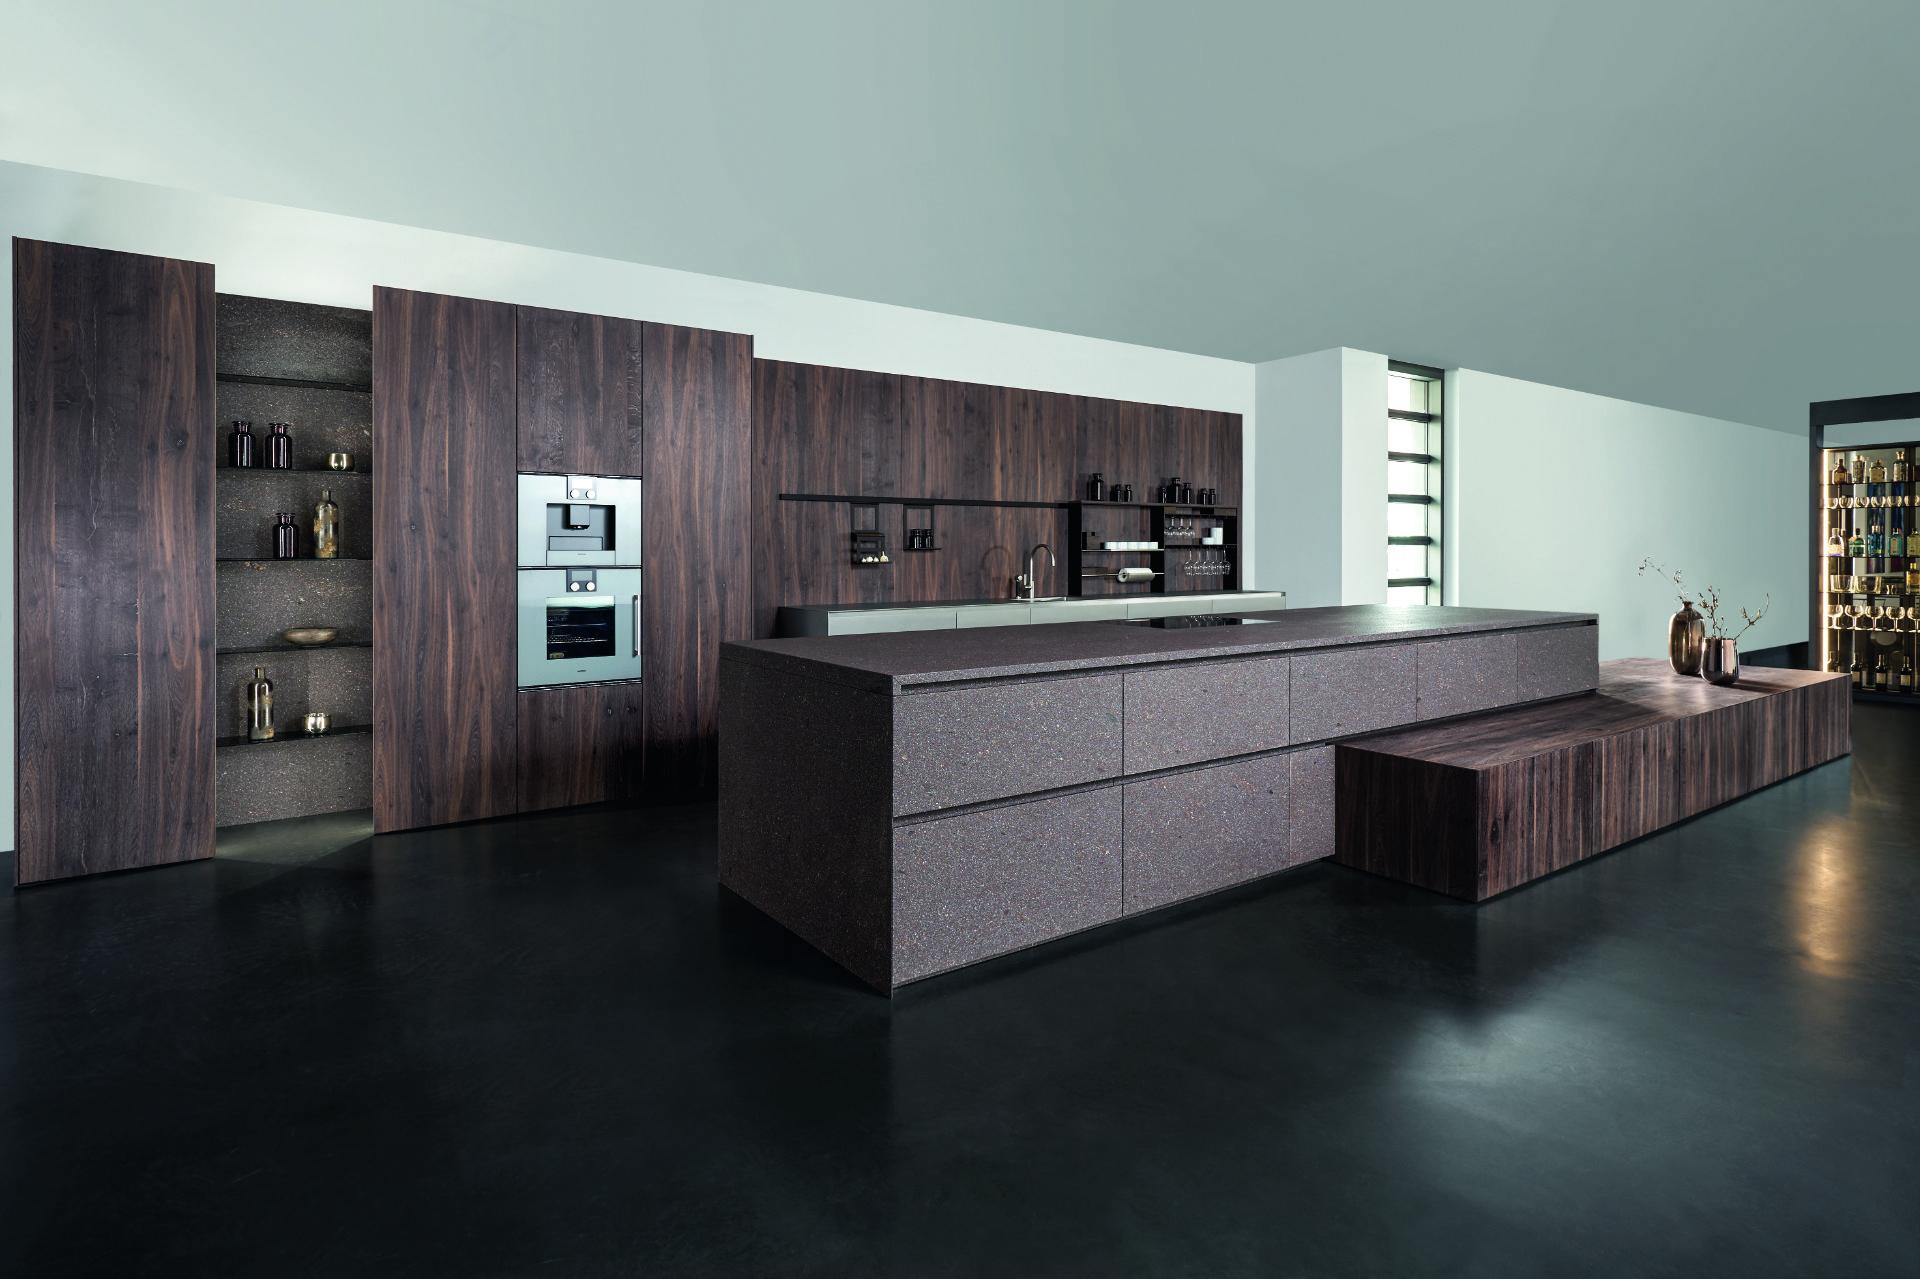 kuechenschmiede eggersmann kuechen design00005. Black Bedroom Furniture Sets. Home Design Ideas